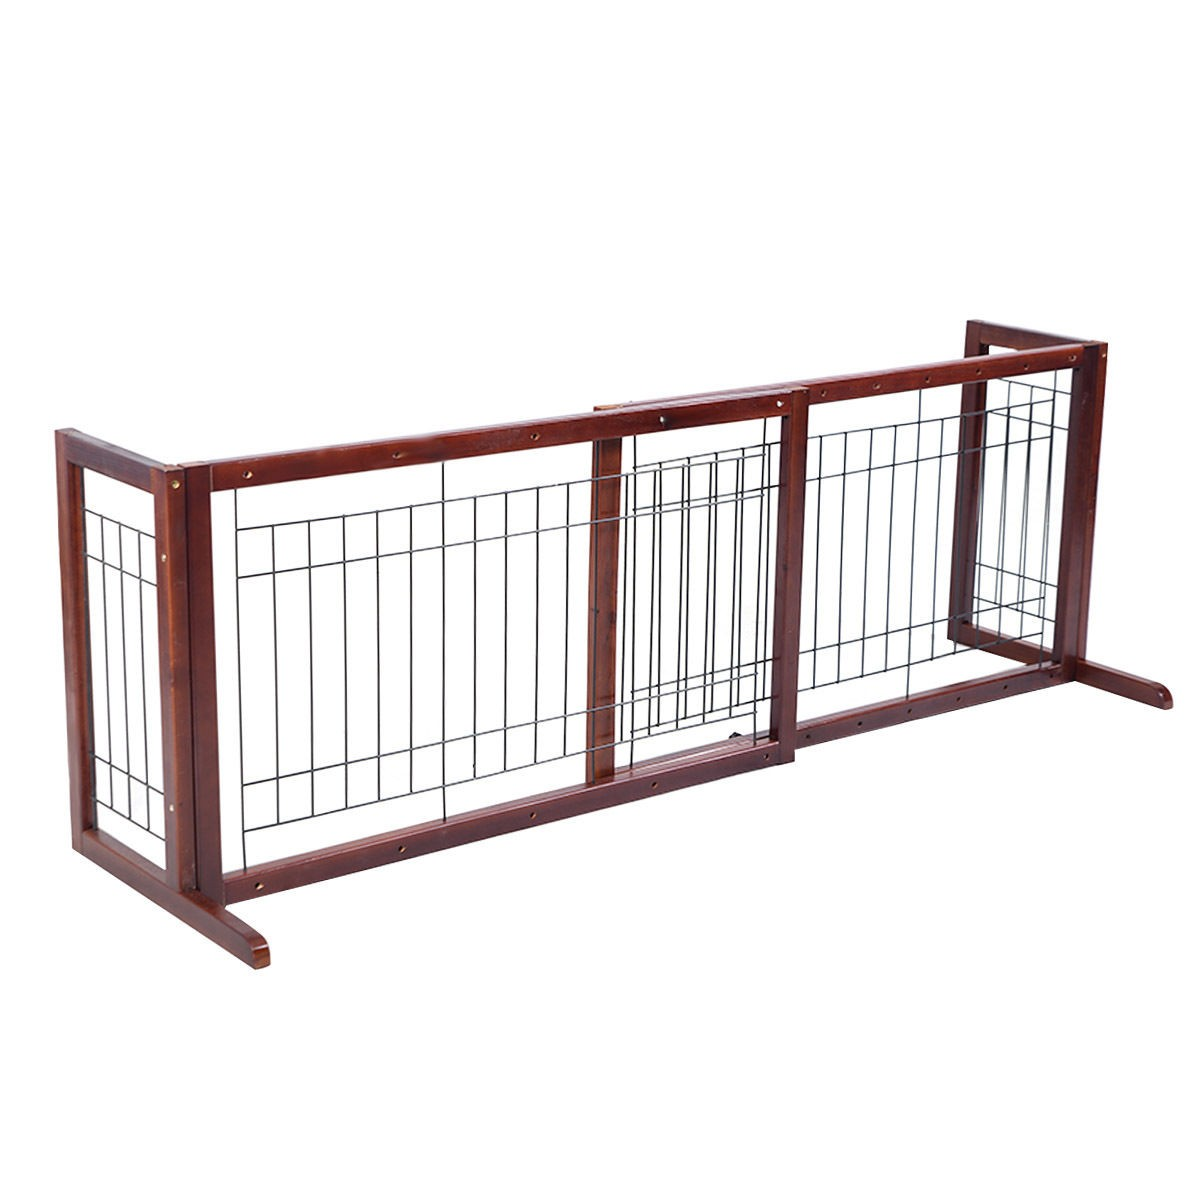 Adjustable Indoor Solid Wood Construction Pet Fence Gate